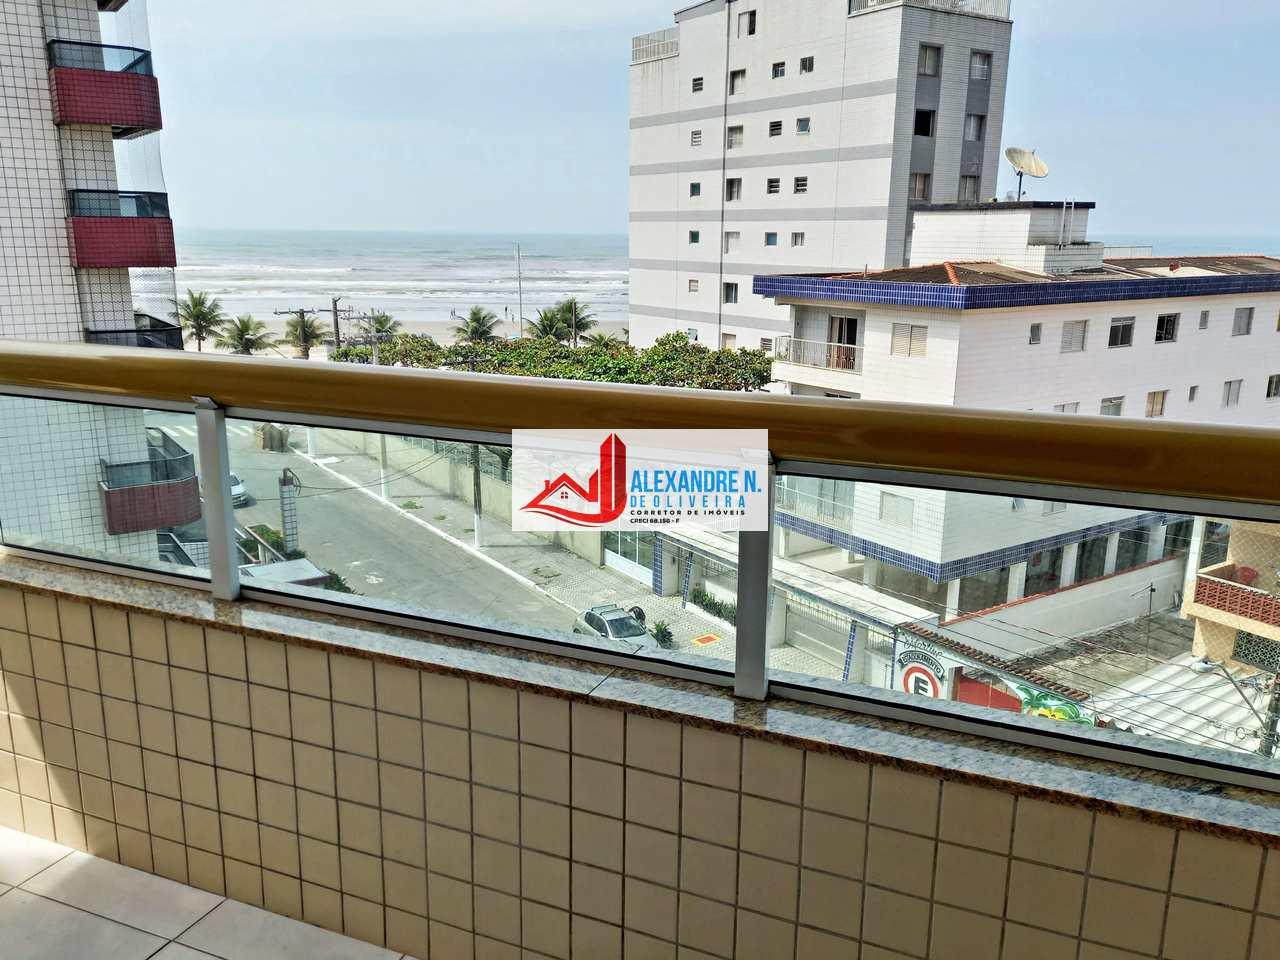 Vista mar, 1 dorm, Caiçara, Praia Grande, R$ 200 mil, AP00761